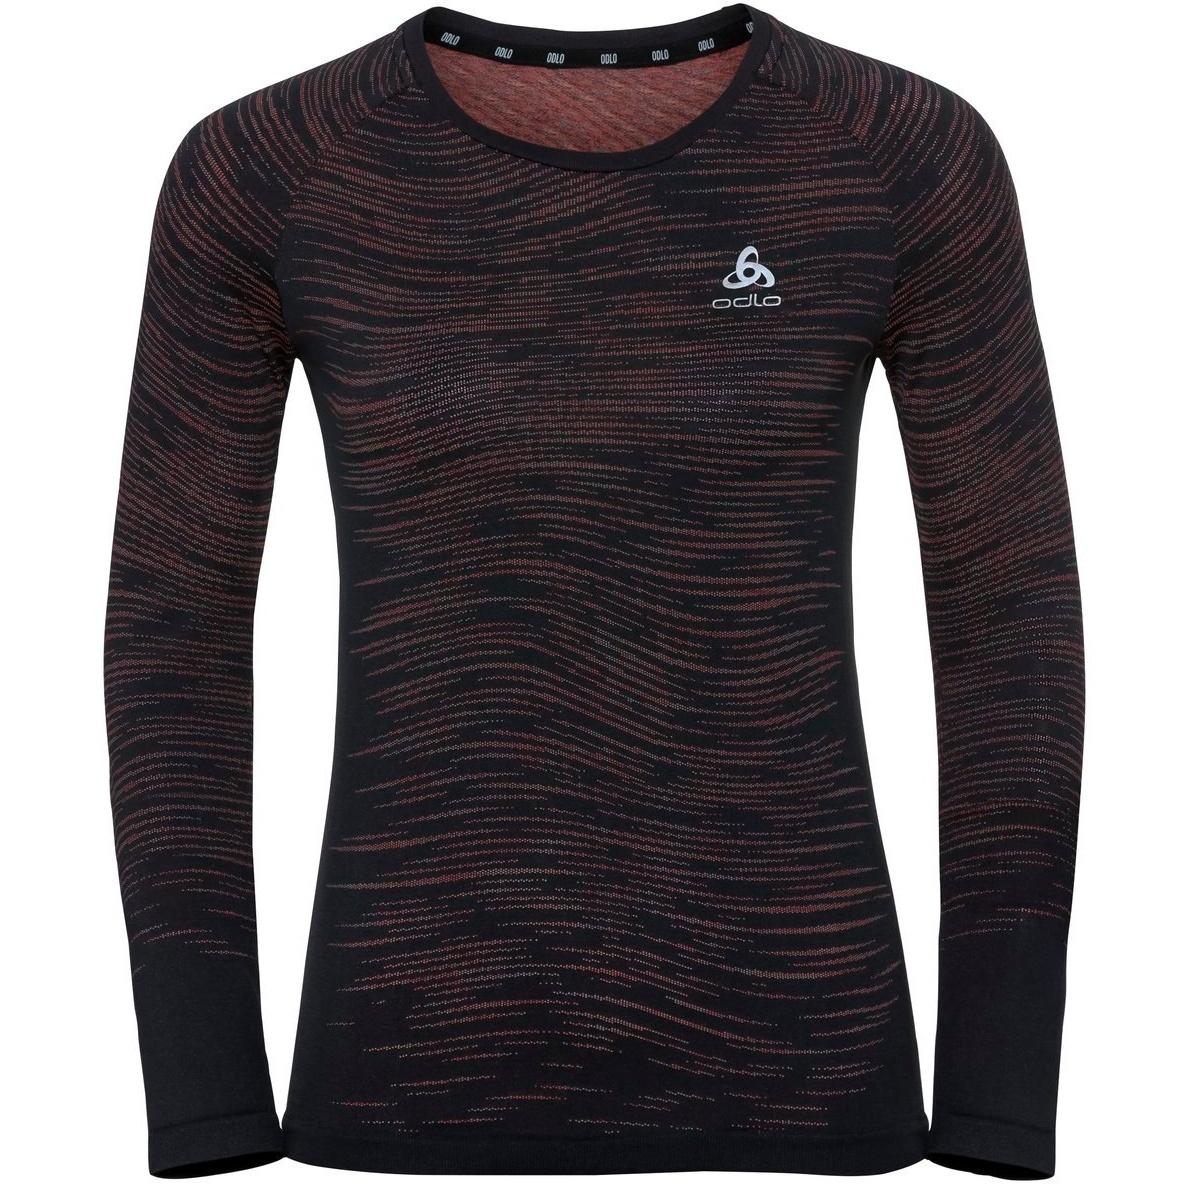 Produktbild von Odlo Damen BLACKCOMB CERAMICOOL Langarmshirt 313391 - 60223 black - space dye